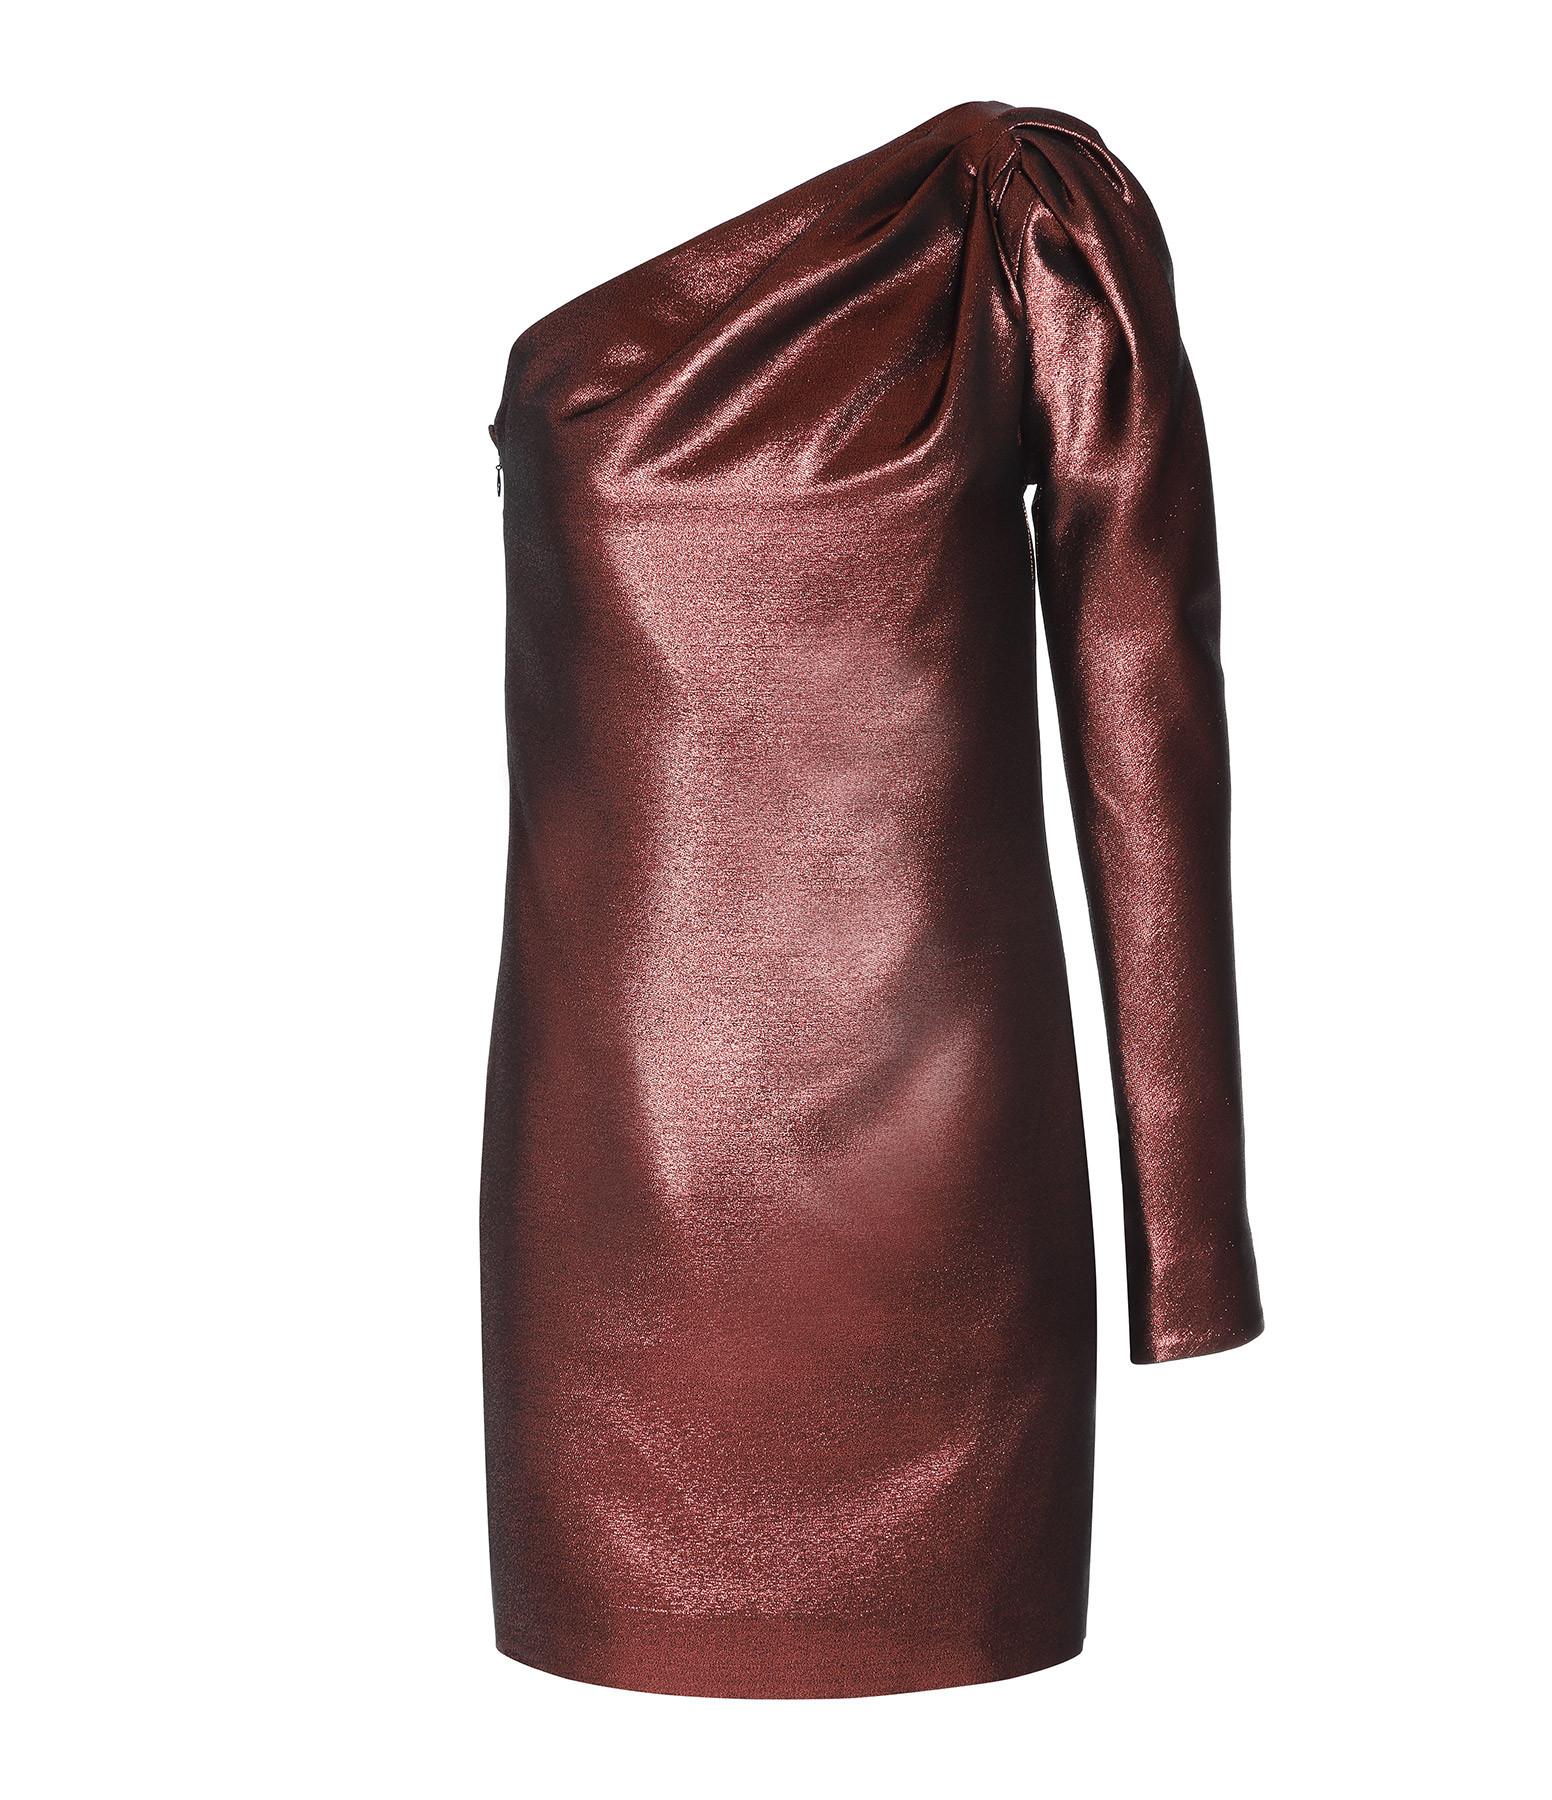 VICTORIA VICTORIA BECKHAM - Robe Epaule Twist Cuivre